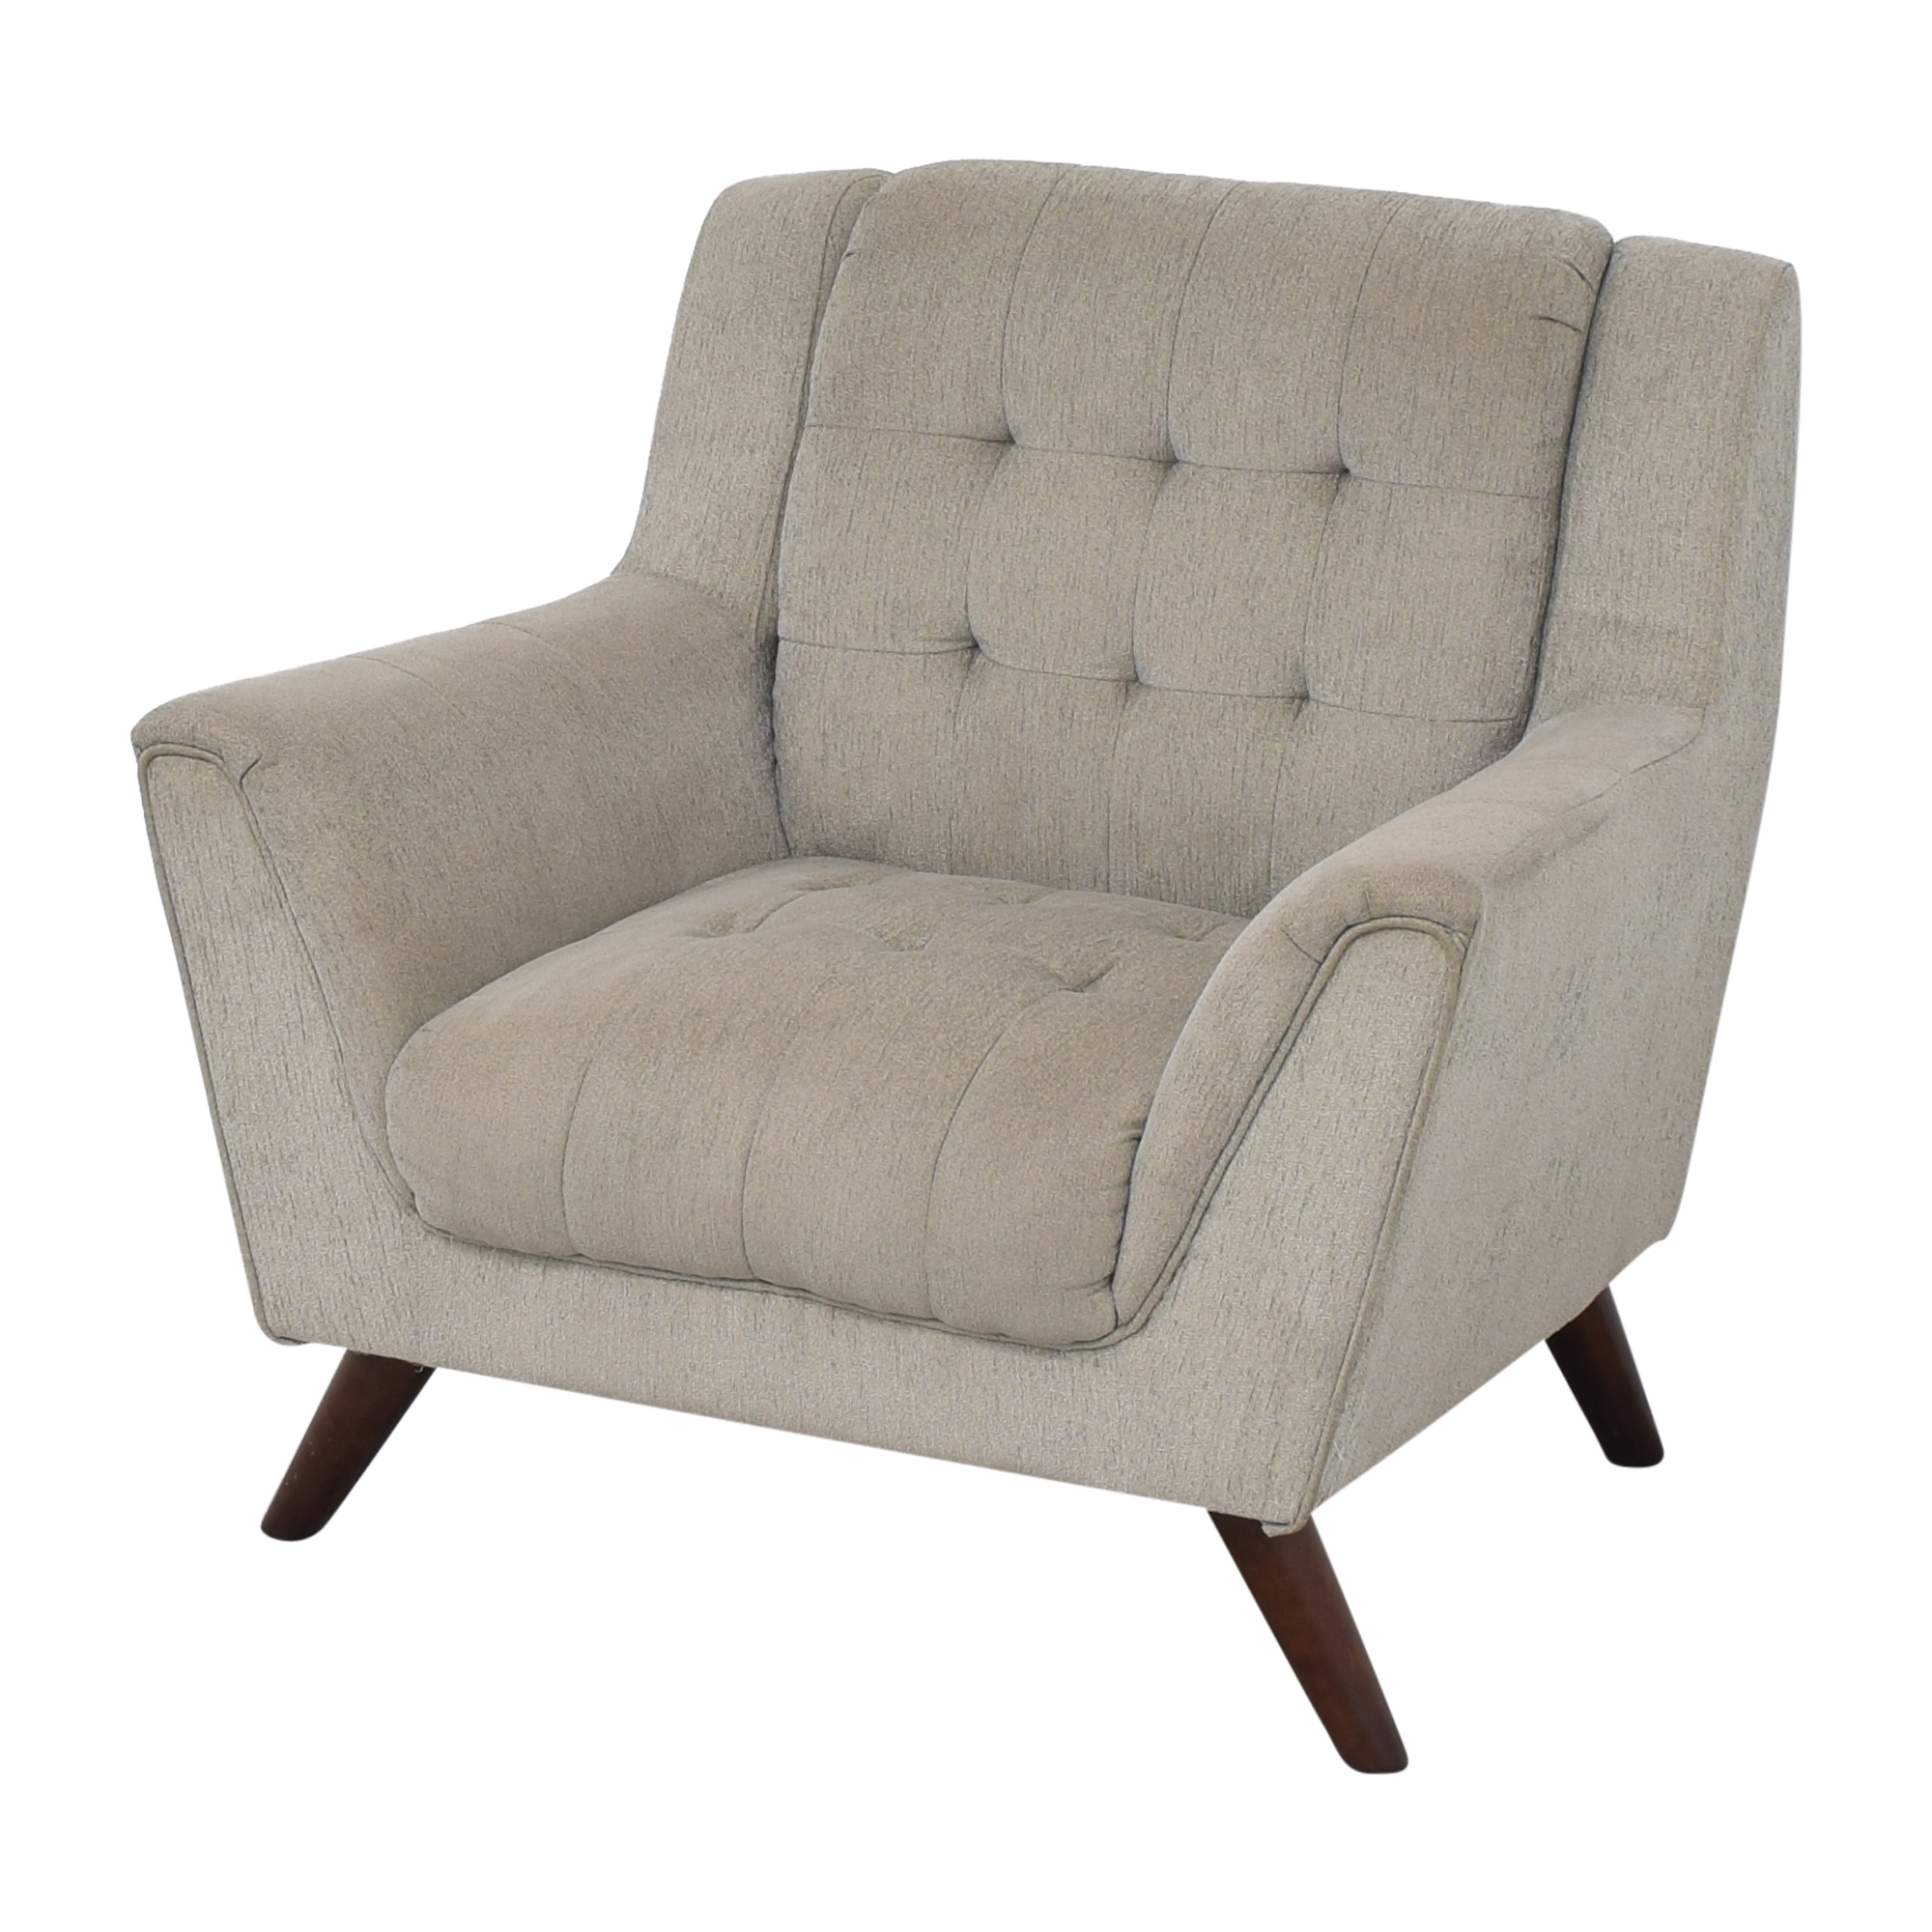 Coaster Fine Furniture Coaster Baby Natalia Chair price